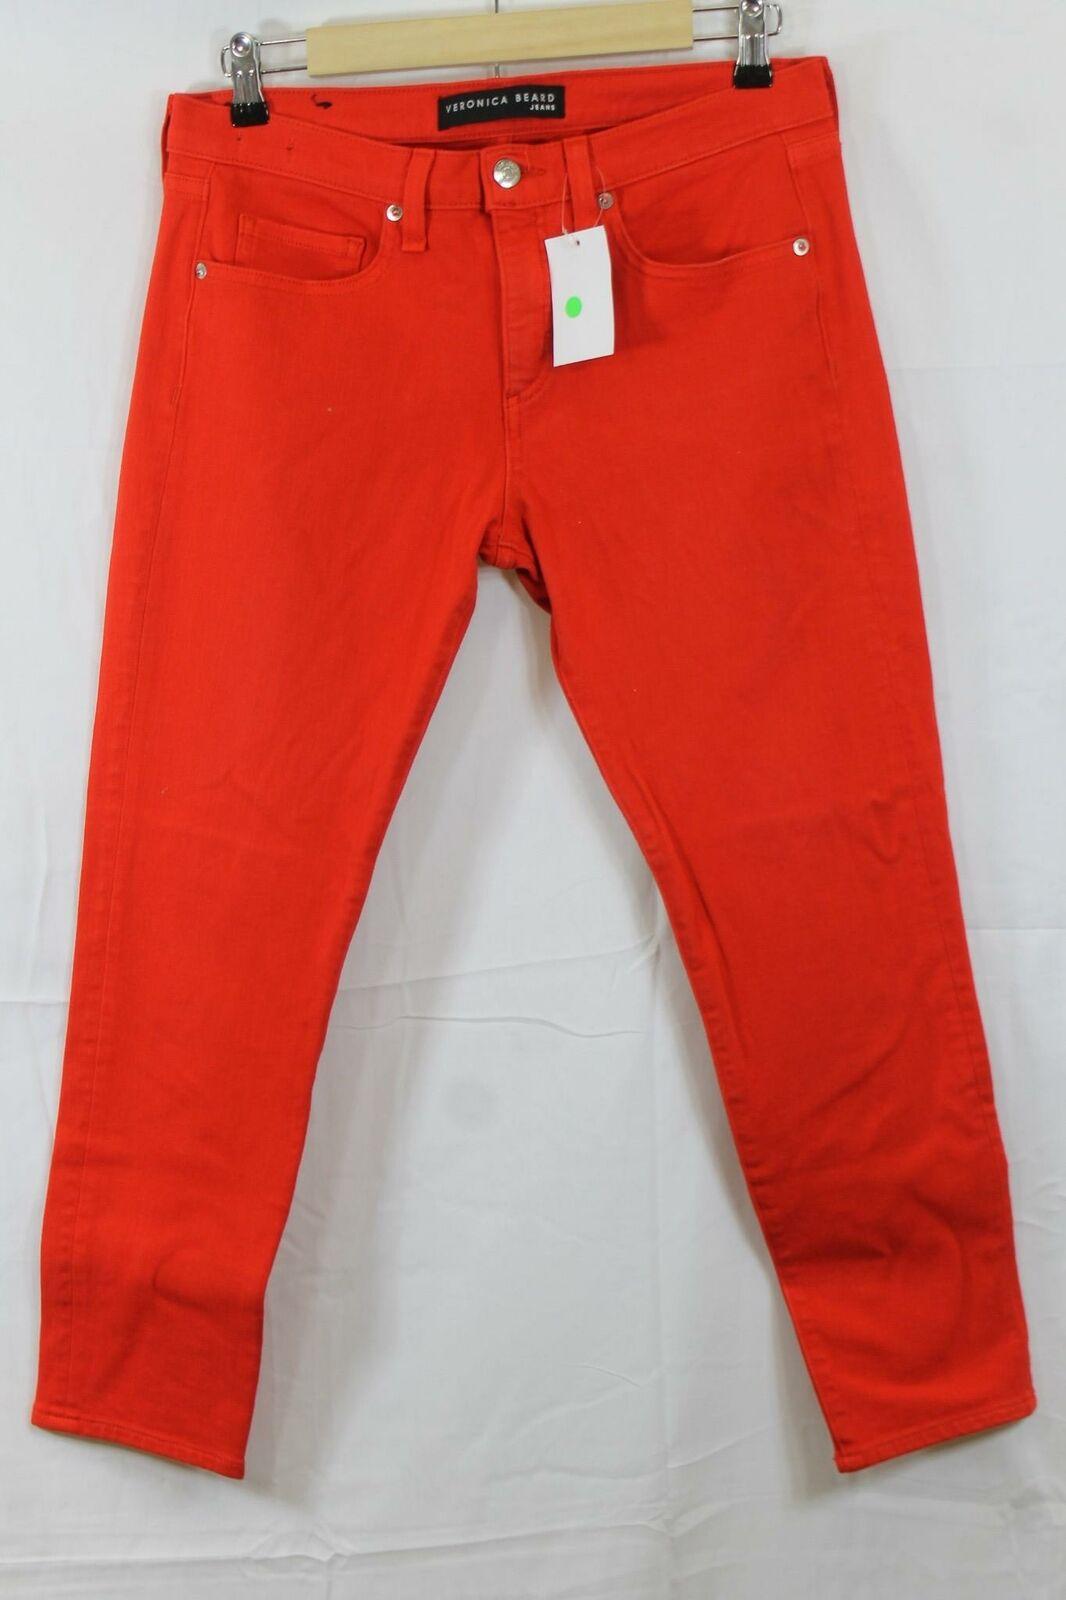 Womens Veronica Beard Brooke Red Crop Jeans Size 29 NWT